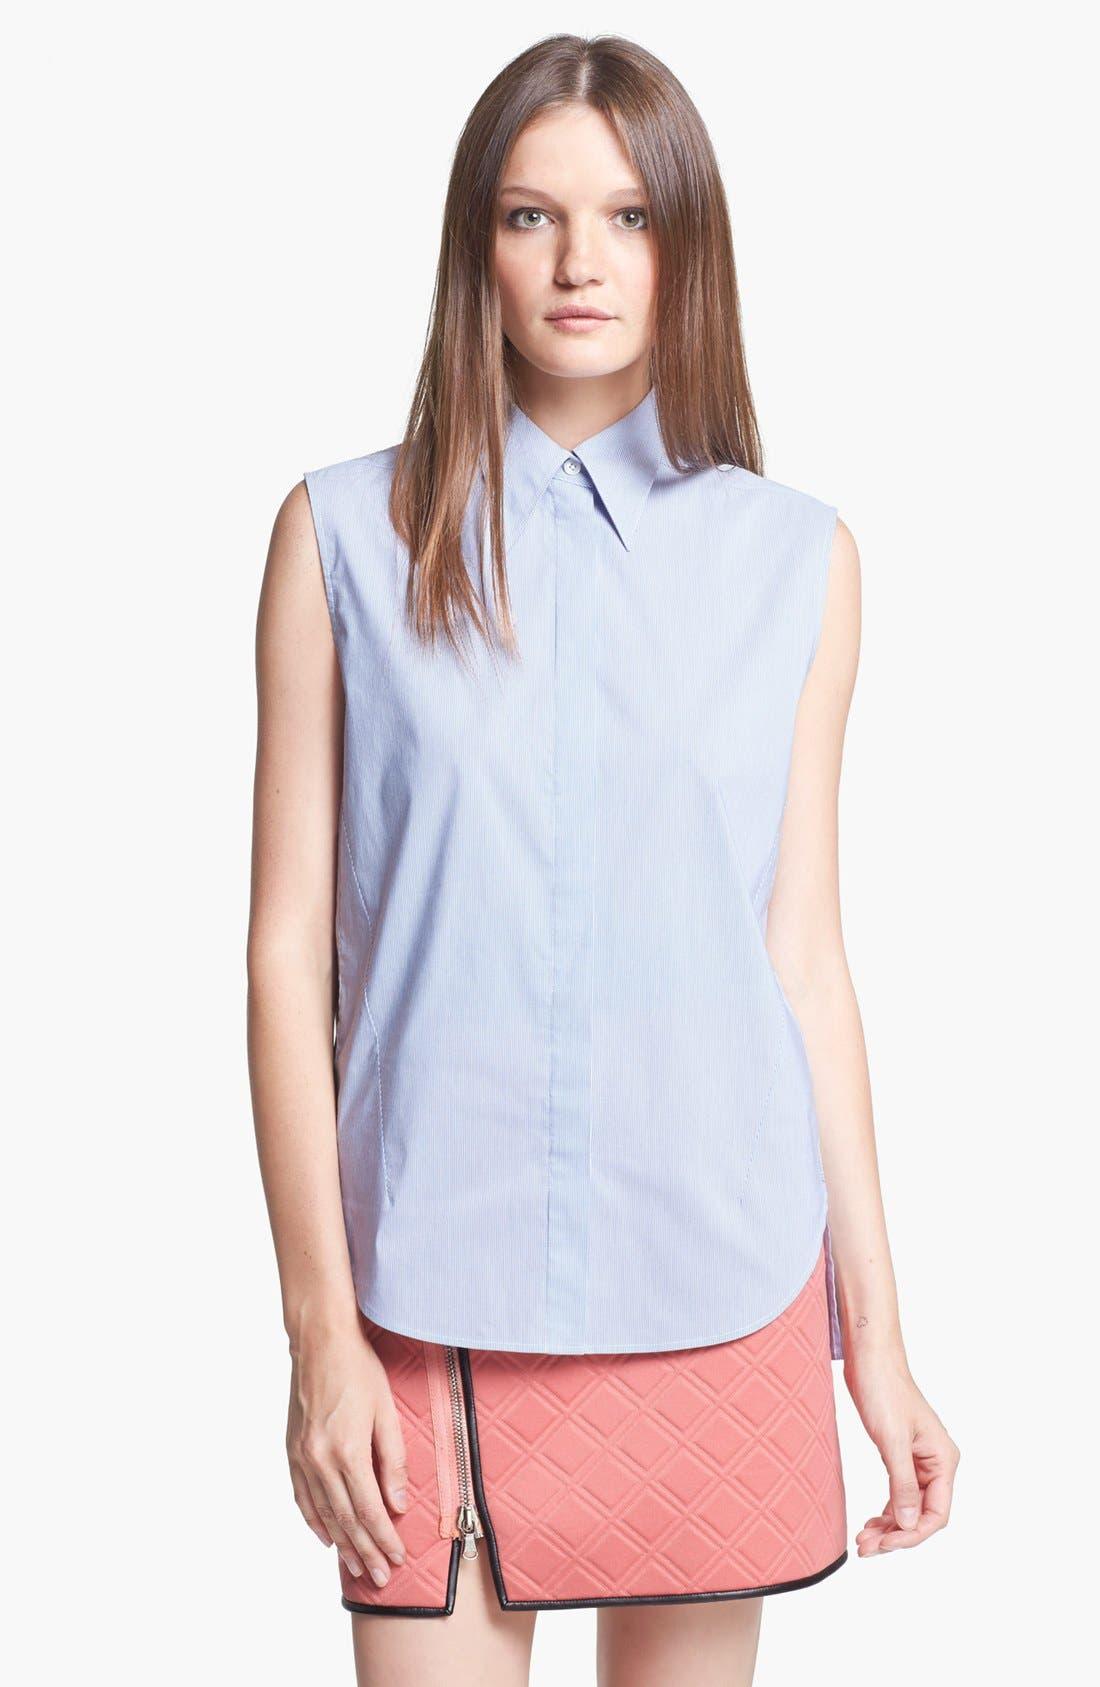 Main Image - 3.1 Phillip Lim Sleeveless Stripe Shirt